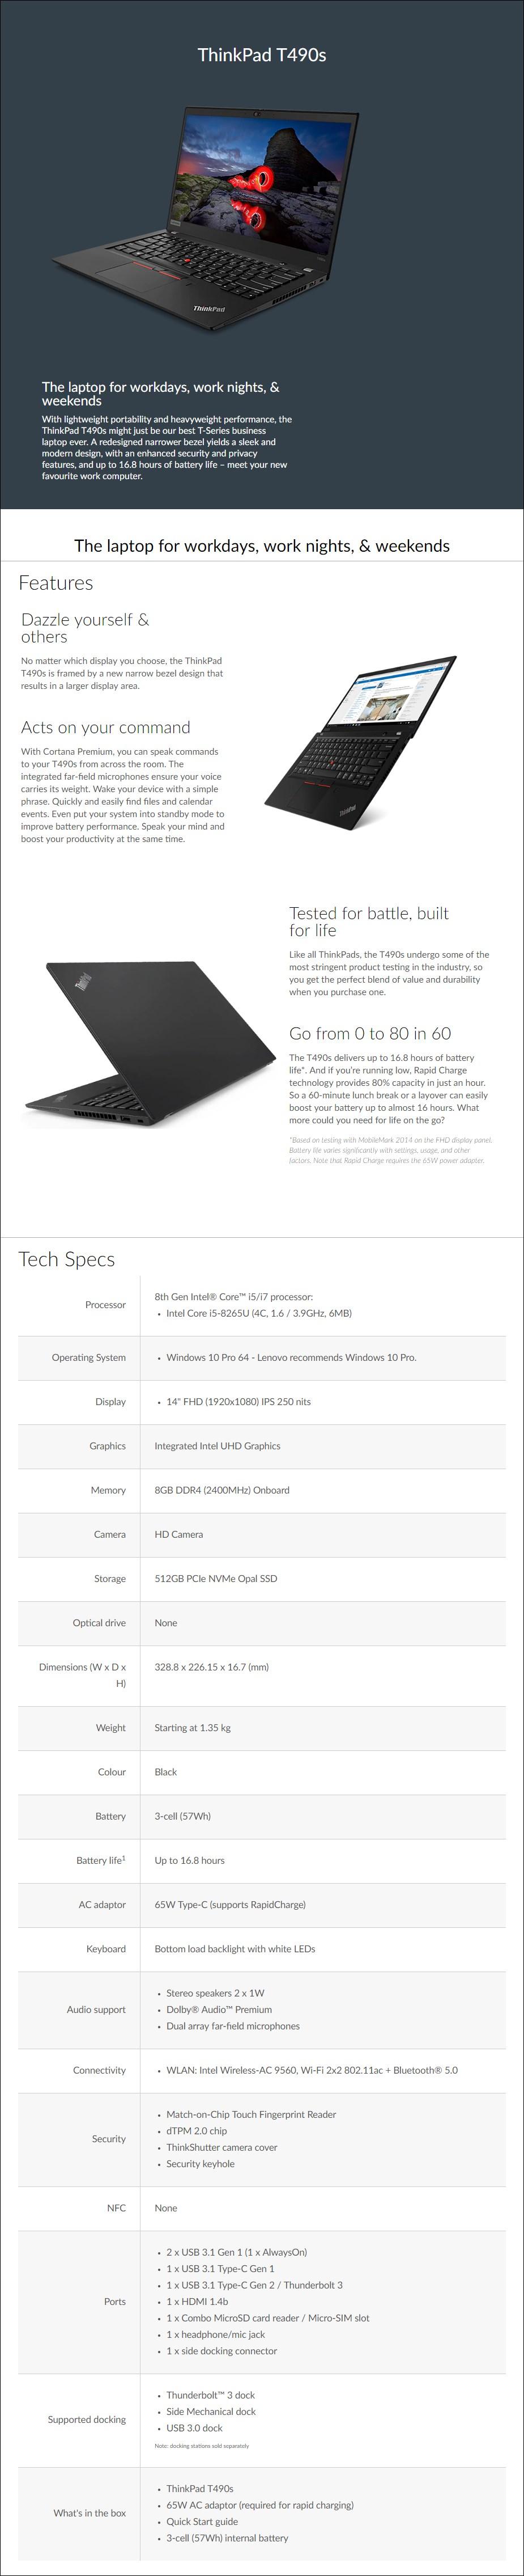 lenovo-thinkpad-t490s-14-laptop-i58265u-8gb-512gb-ssd-w10p-ac26762-1.jpg